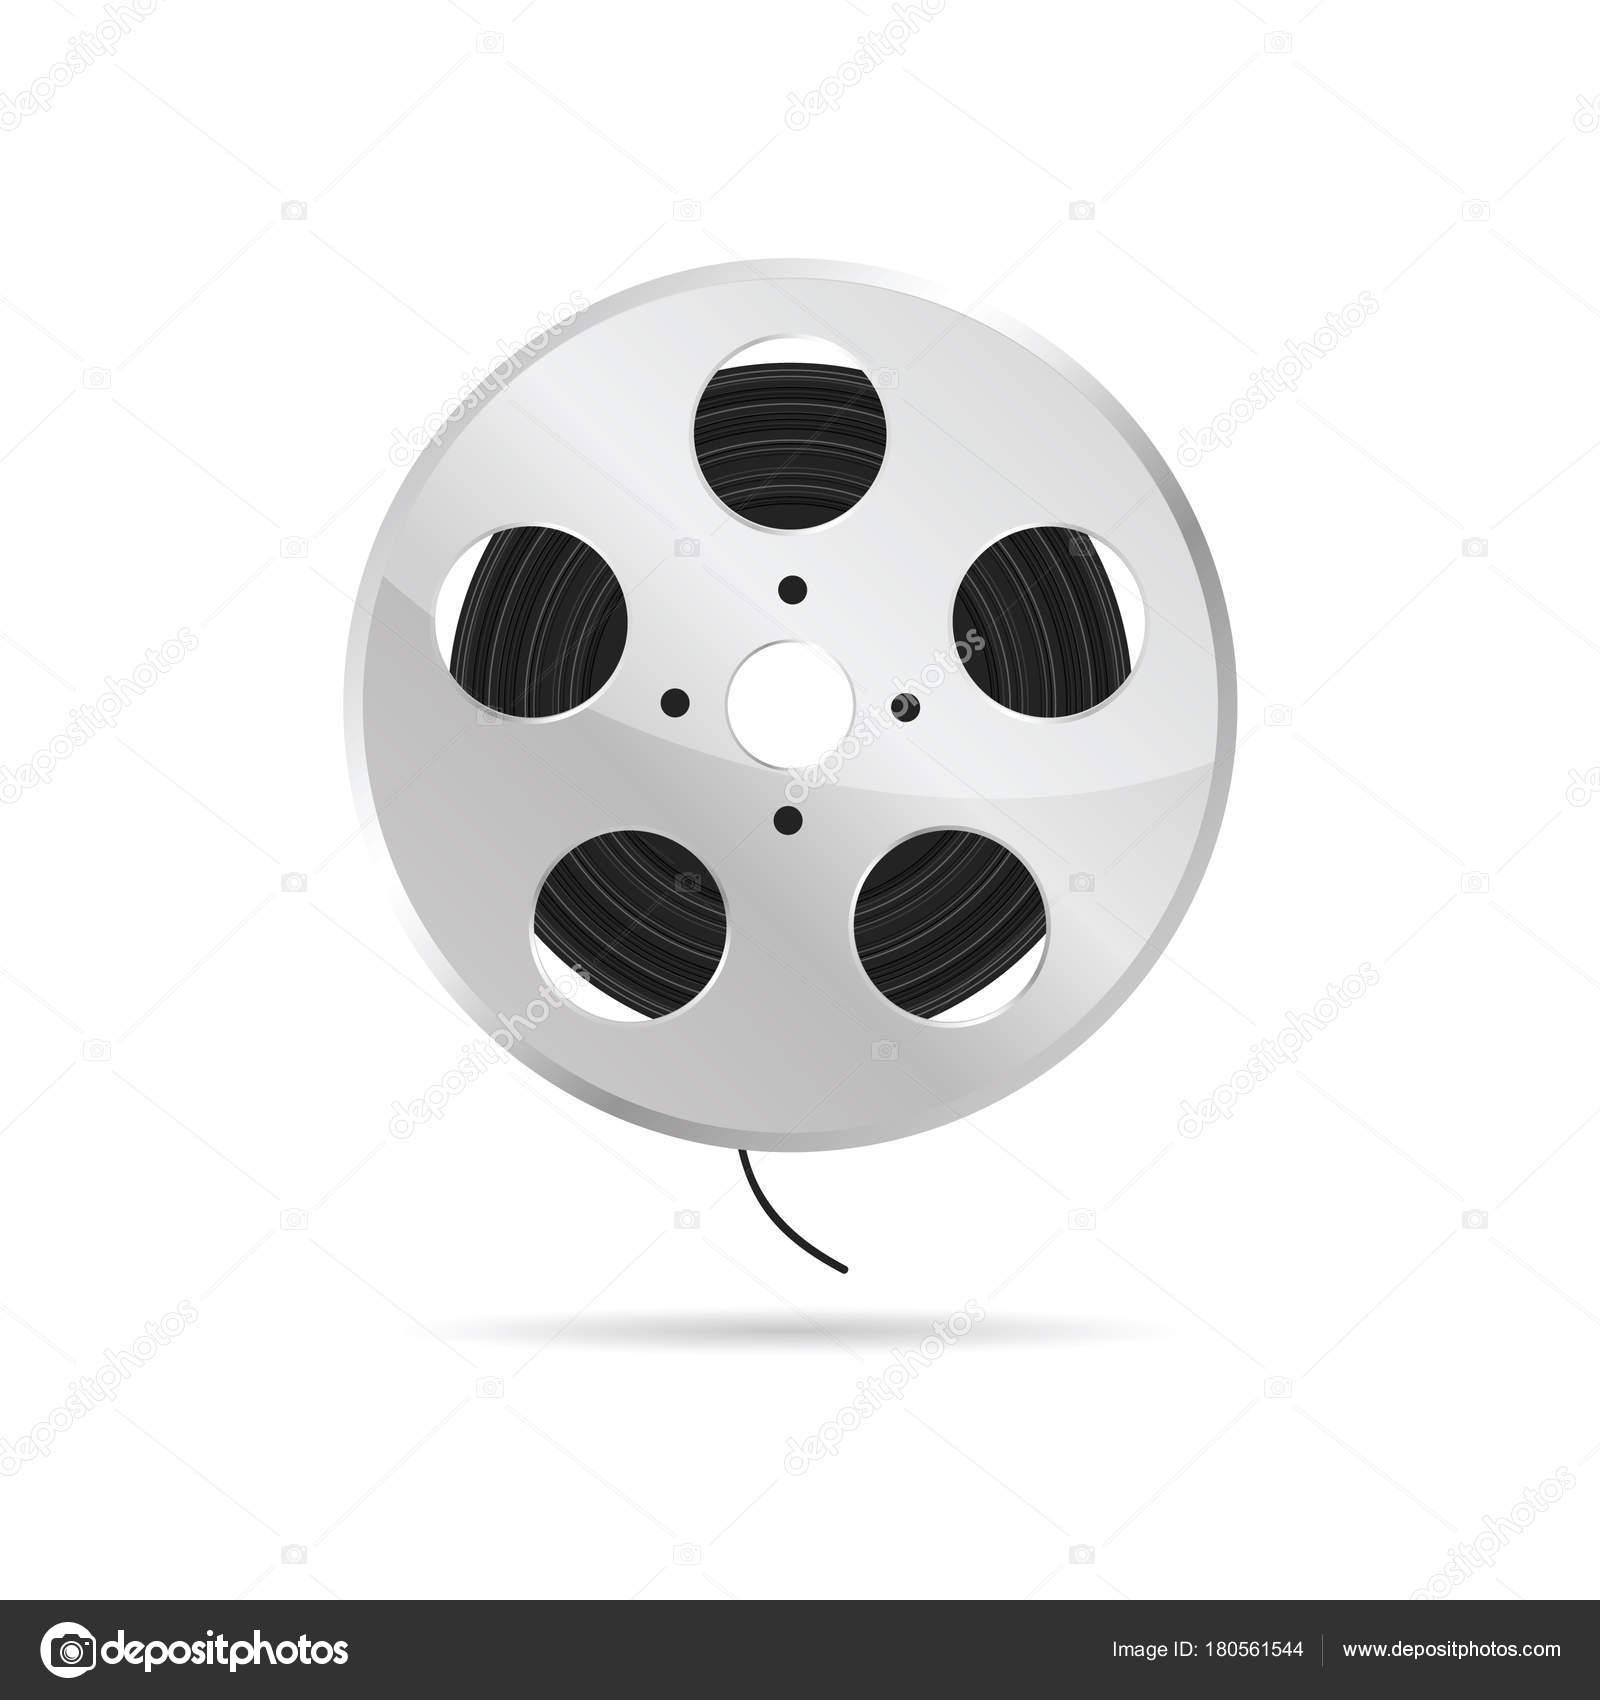 Film Tape Roll Illustration Stock Vector C Drgaga 180561544